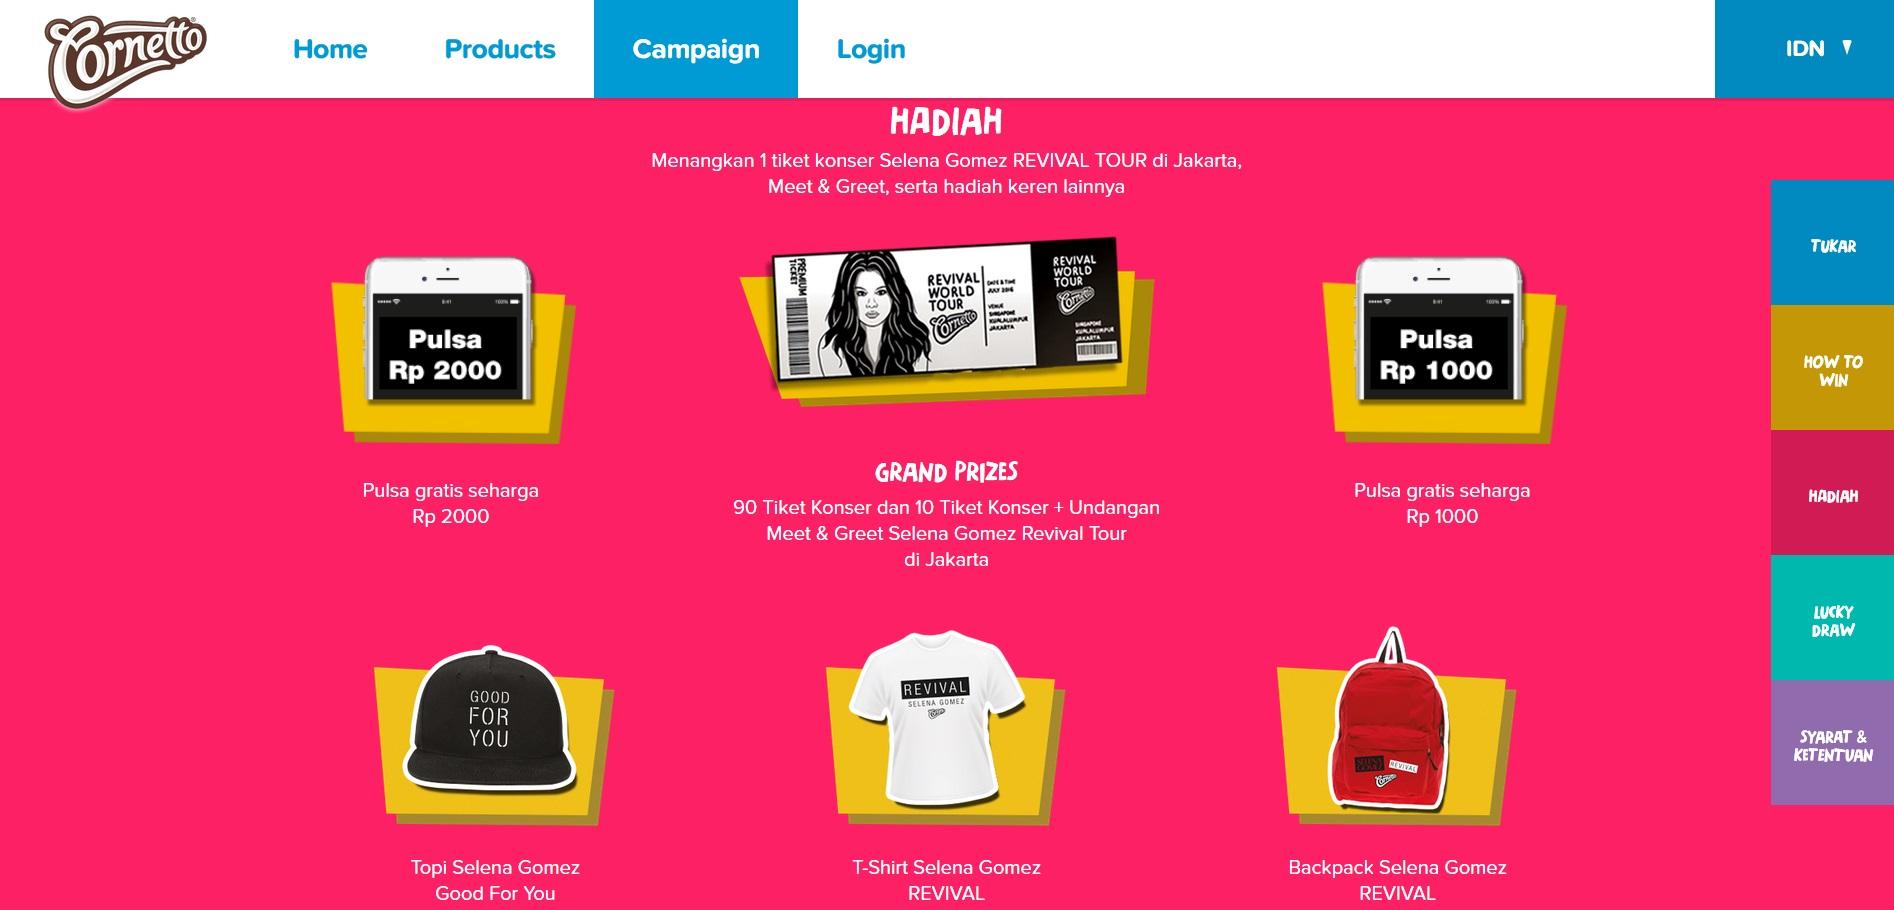 T-Shirt Selena Gomez Revival